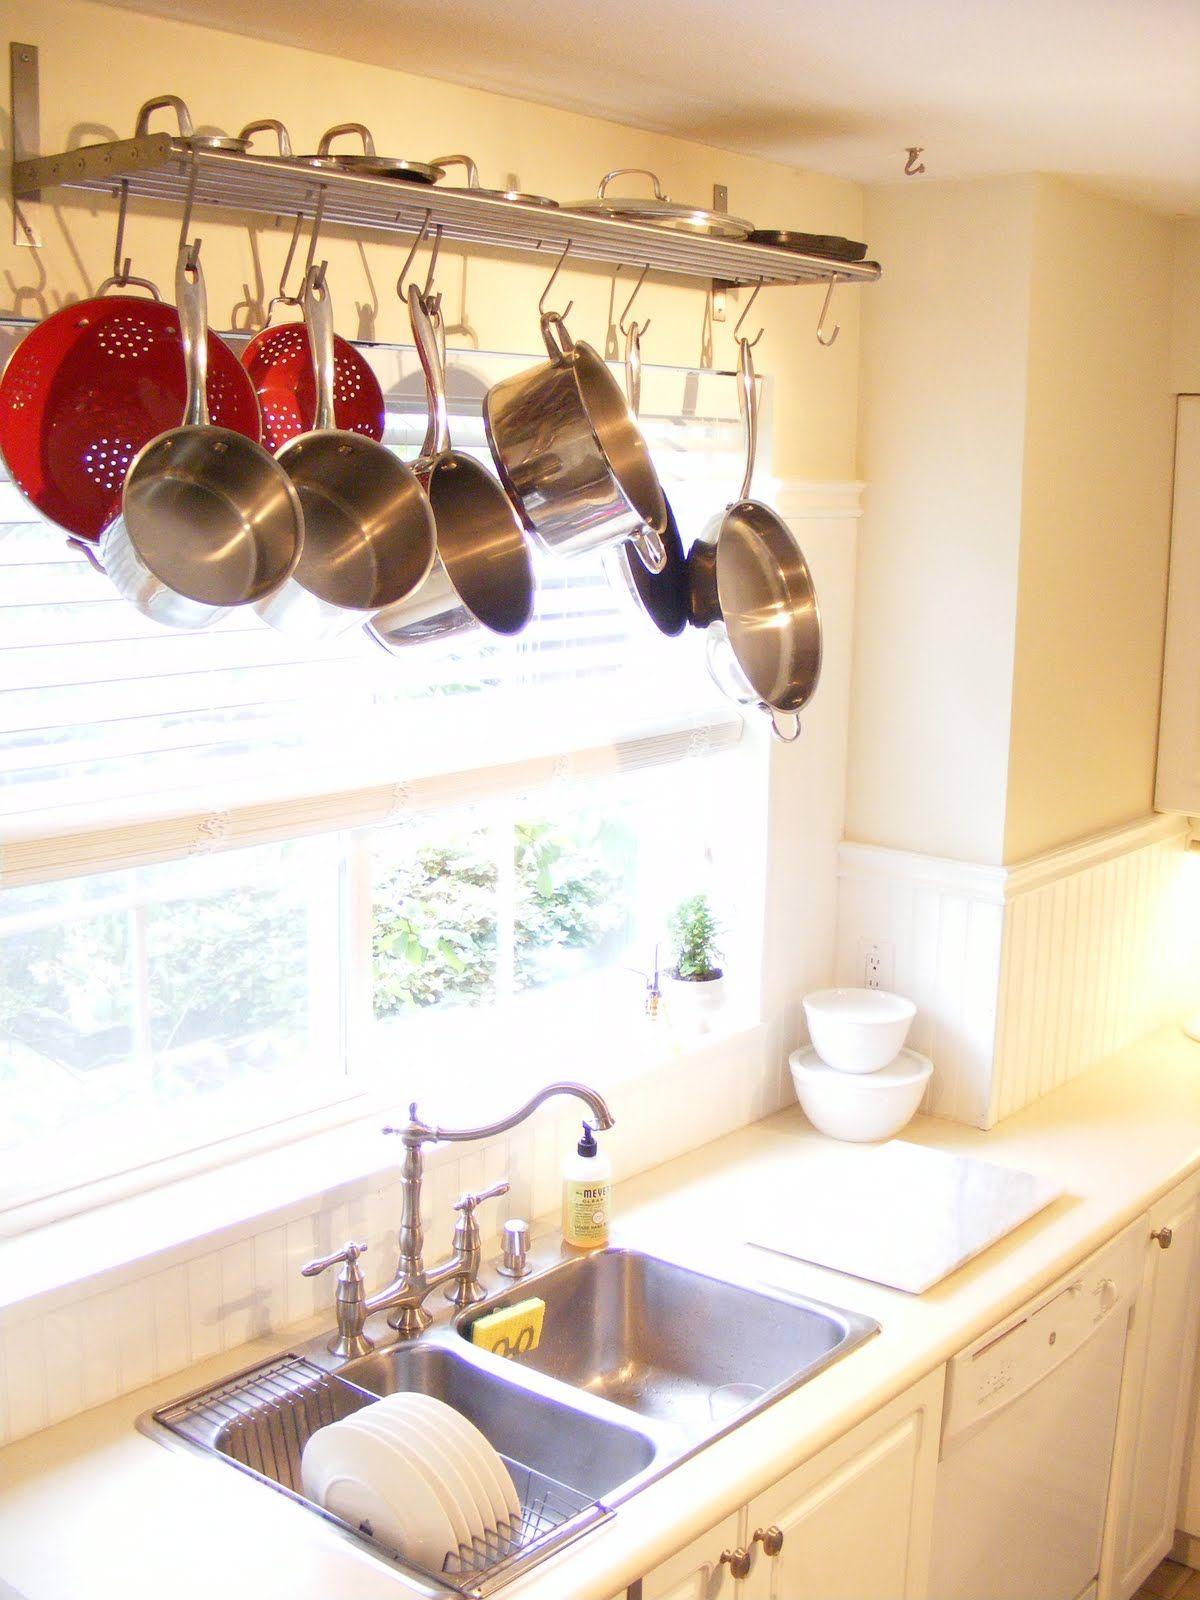 Our Hat Rack/Pot Rack #KitchenIdea #Kitchens   Kitchen upgrades ...